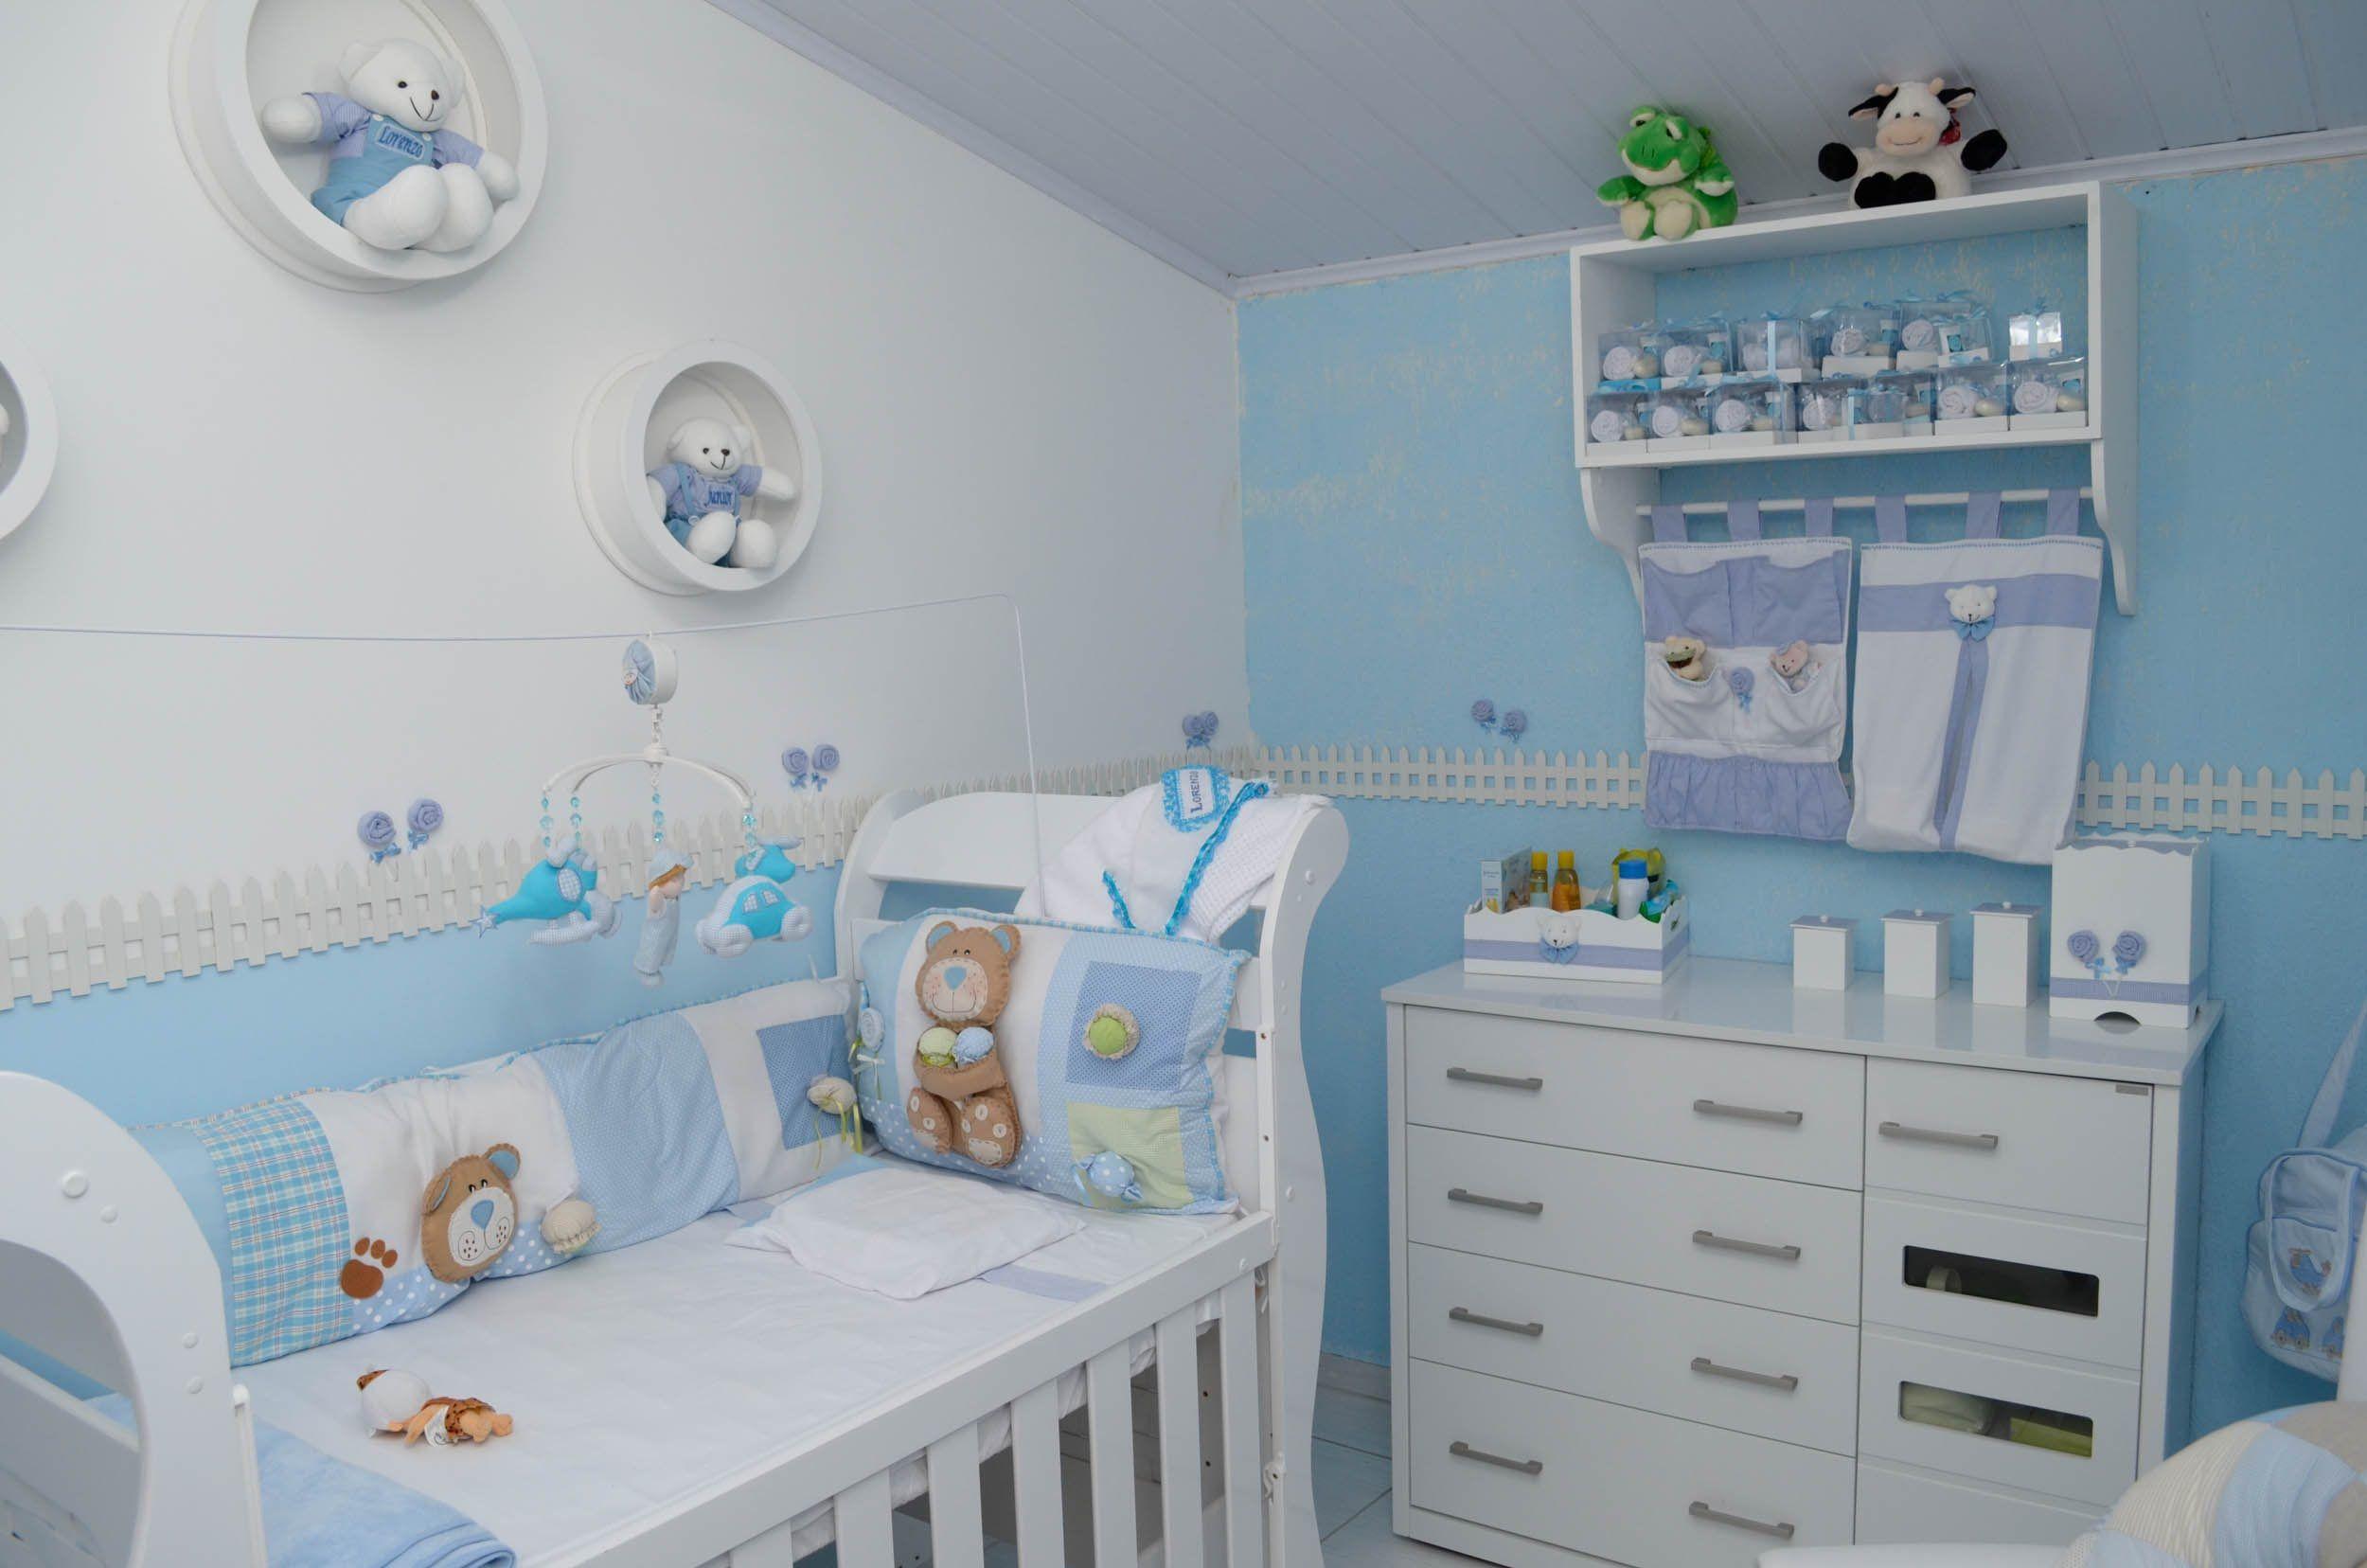 decoracion de cuartos pequeos para nios recien nacidos como decorar